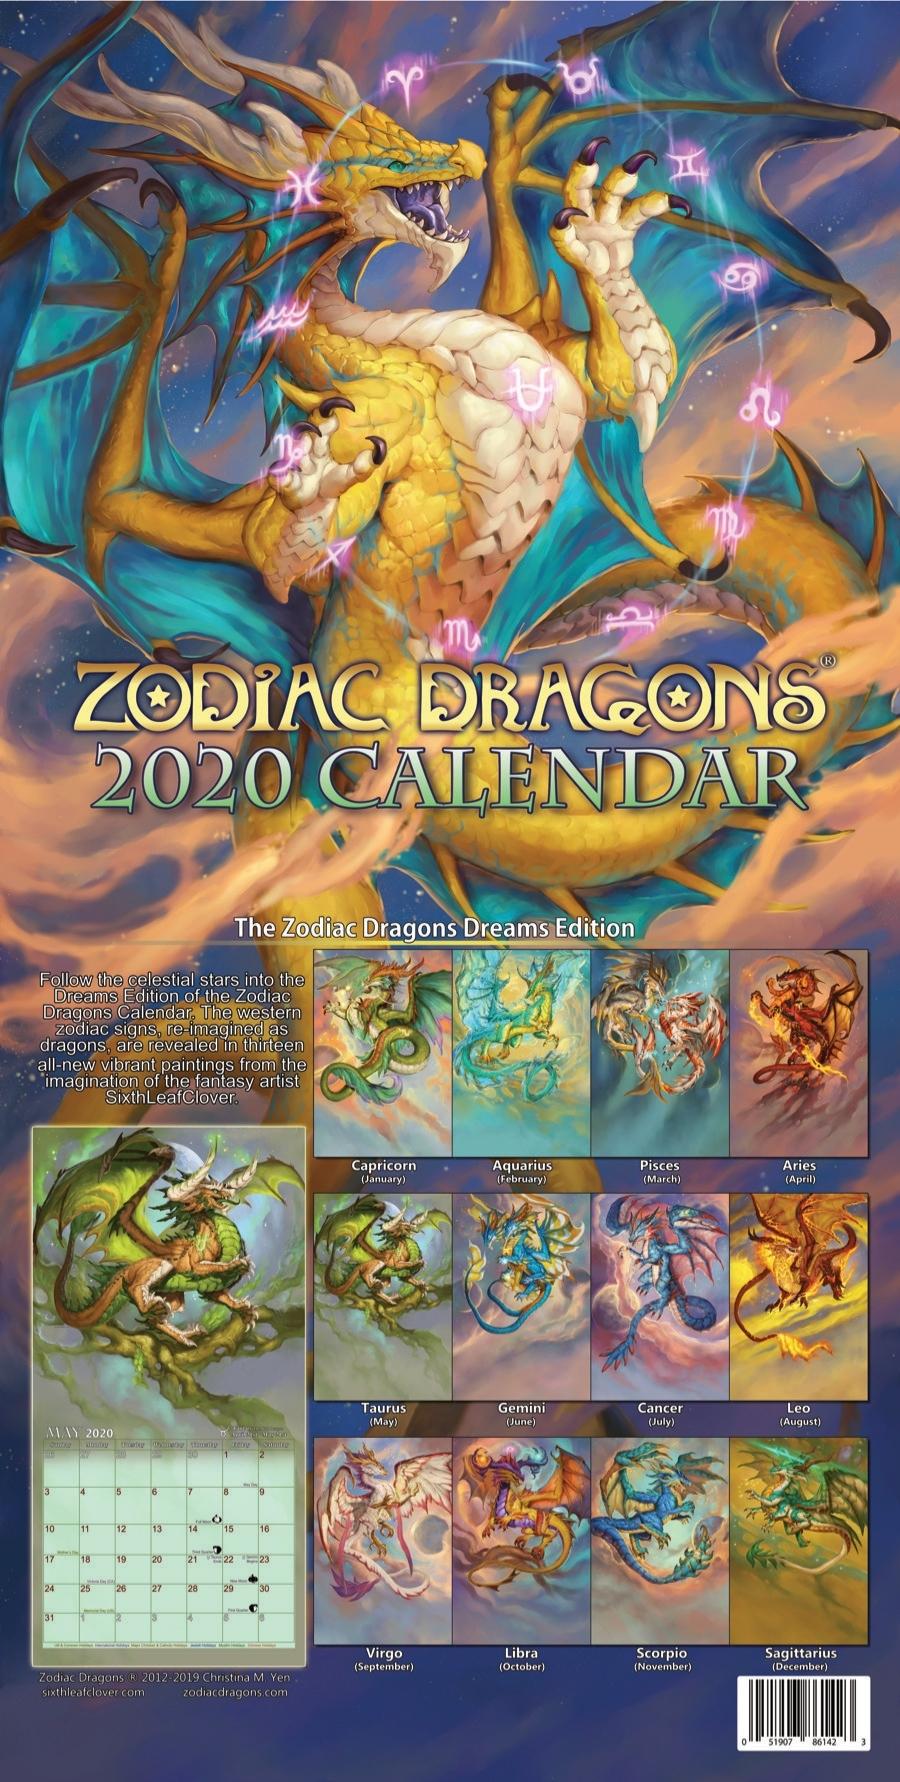 2020 Zodiac Dragons Calendar - Pre-Ordersixthleafclover